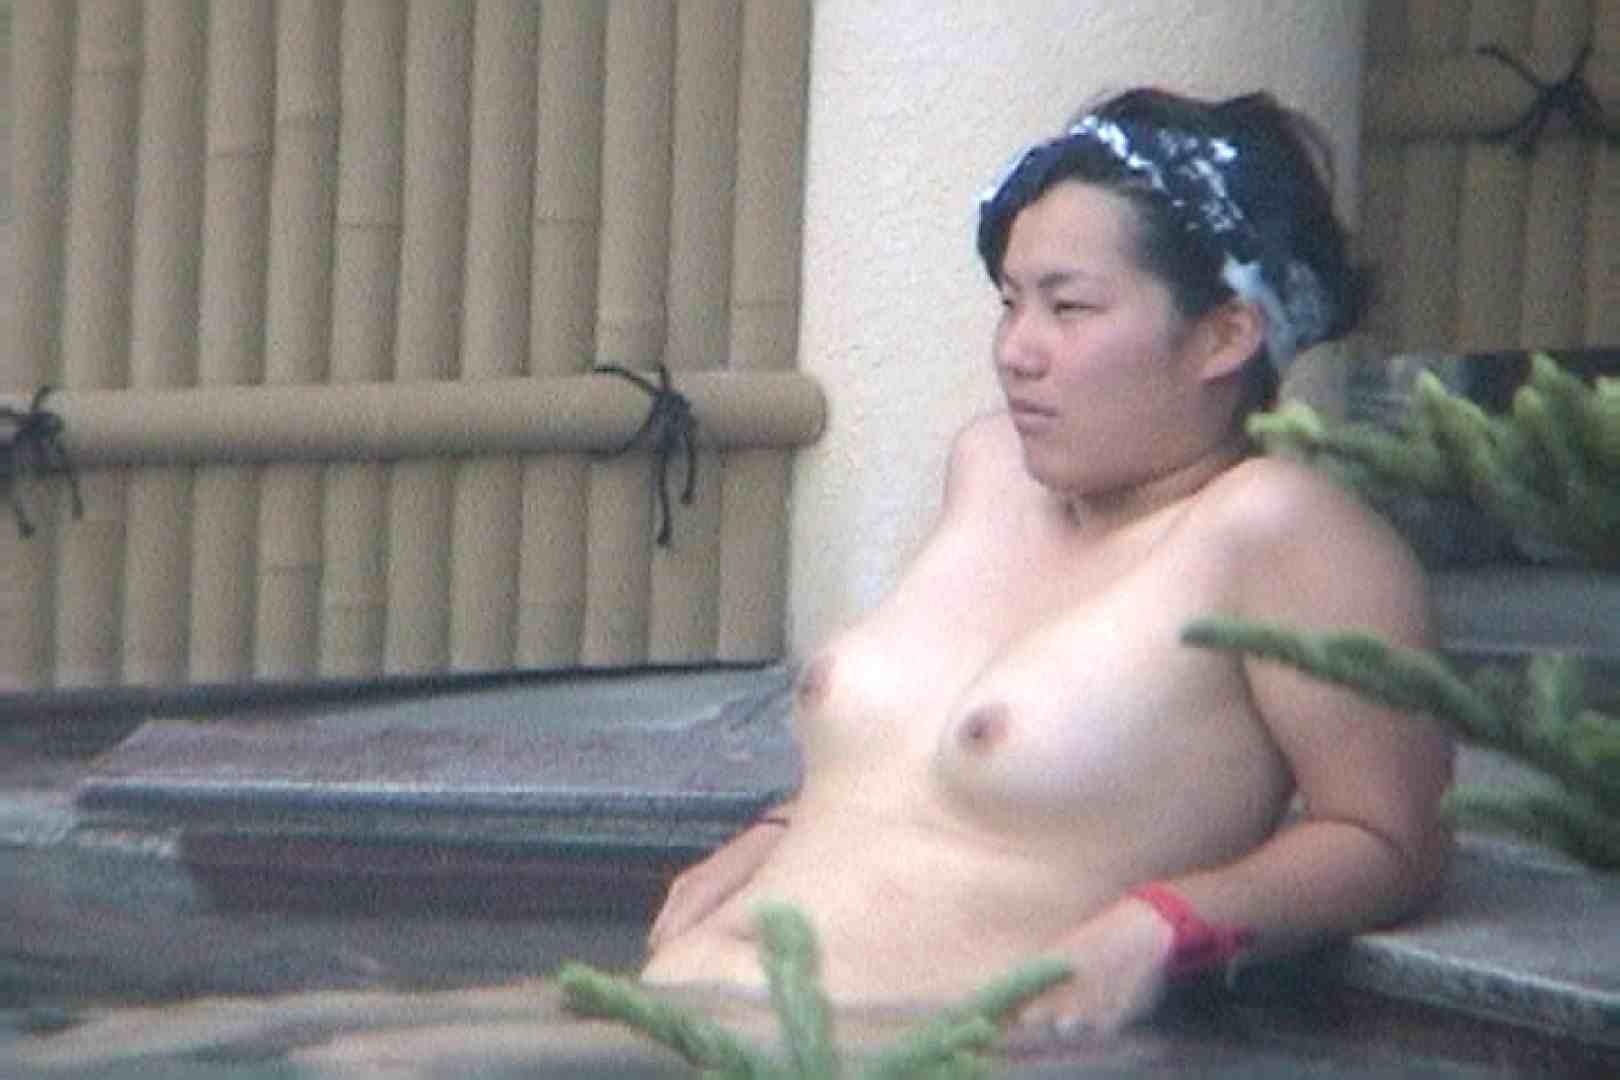 Aquaな露天風呂Vol.103 いやらしいOL 盗撮画像 71連発 47